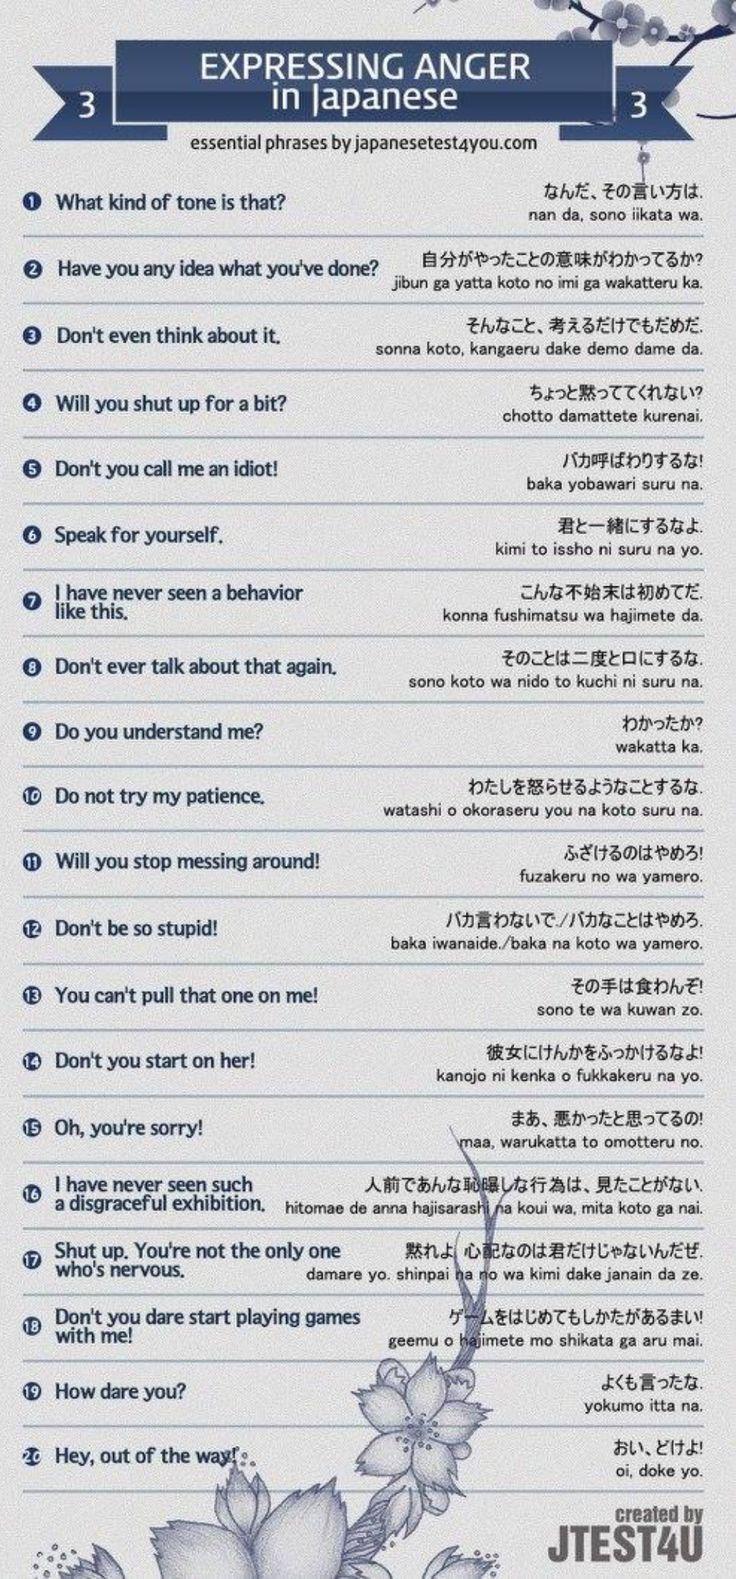 Expressing Anger - Studies Abroad in Japan. GoldenWay Global Education VietNam Du hoc nhat ban  http://goldenway.edu.vn/du-hoc-nhat-ban-2.html